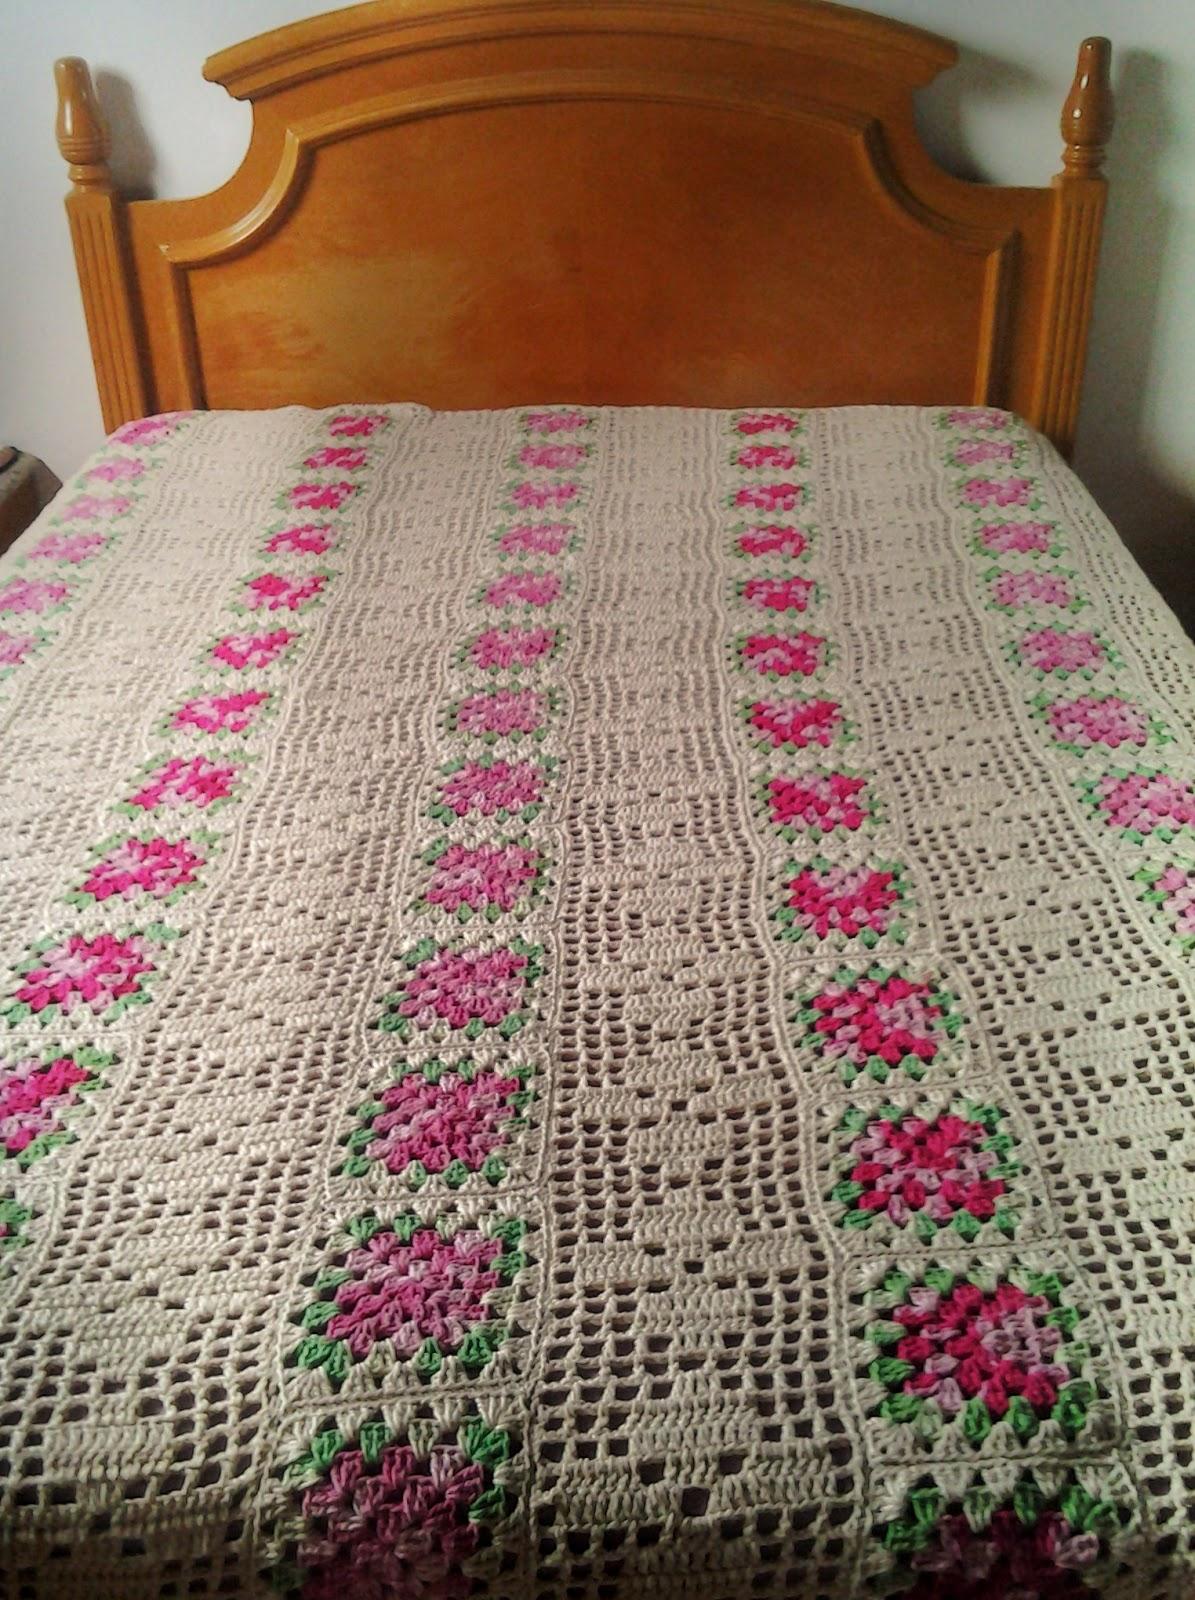 Colcha de crochê cama de casal.